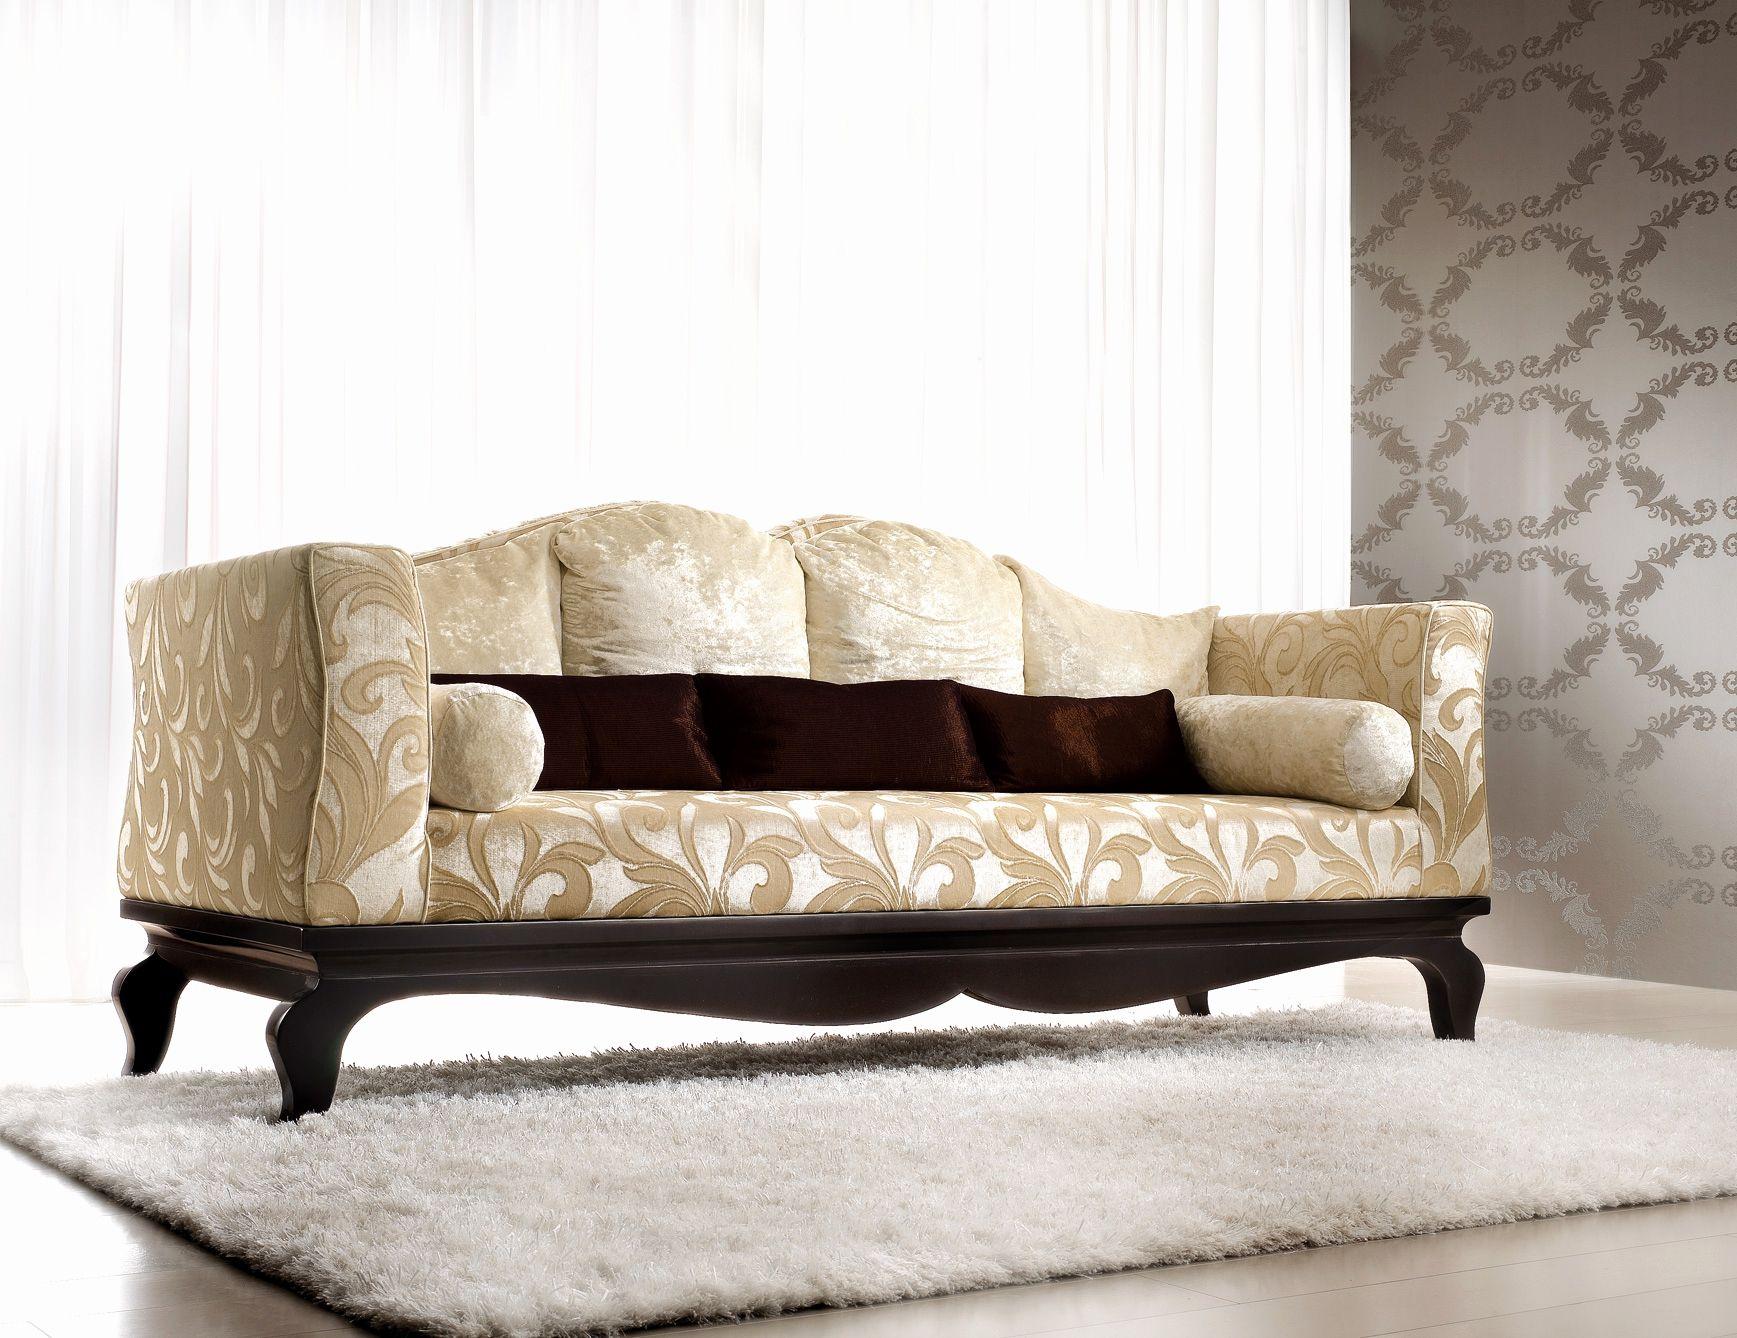 New Modern Sofa Chair Designs Photos Furniture Italian Designer Luxury High Endasa Chairs Mt Materia Modern Sofa Chair Leather Sofa Bed Upholstered Sofa